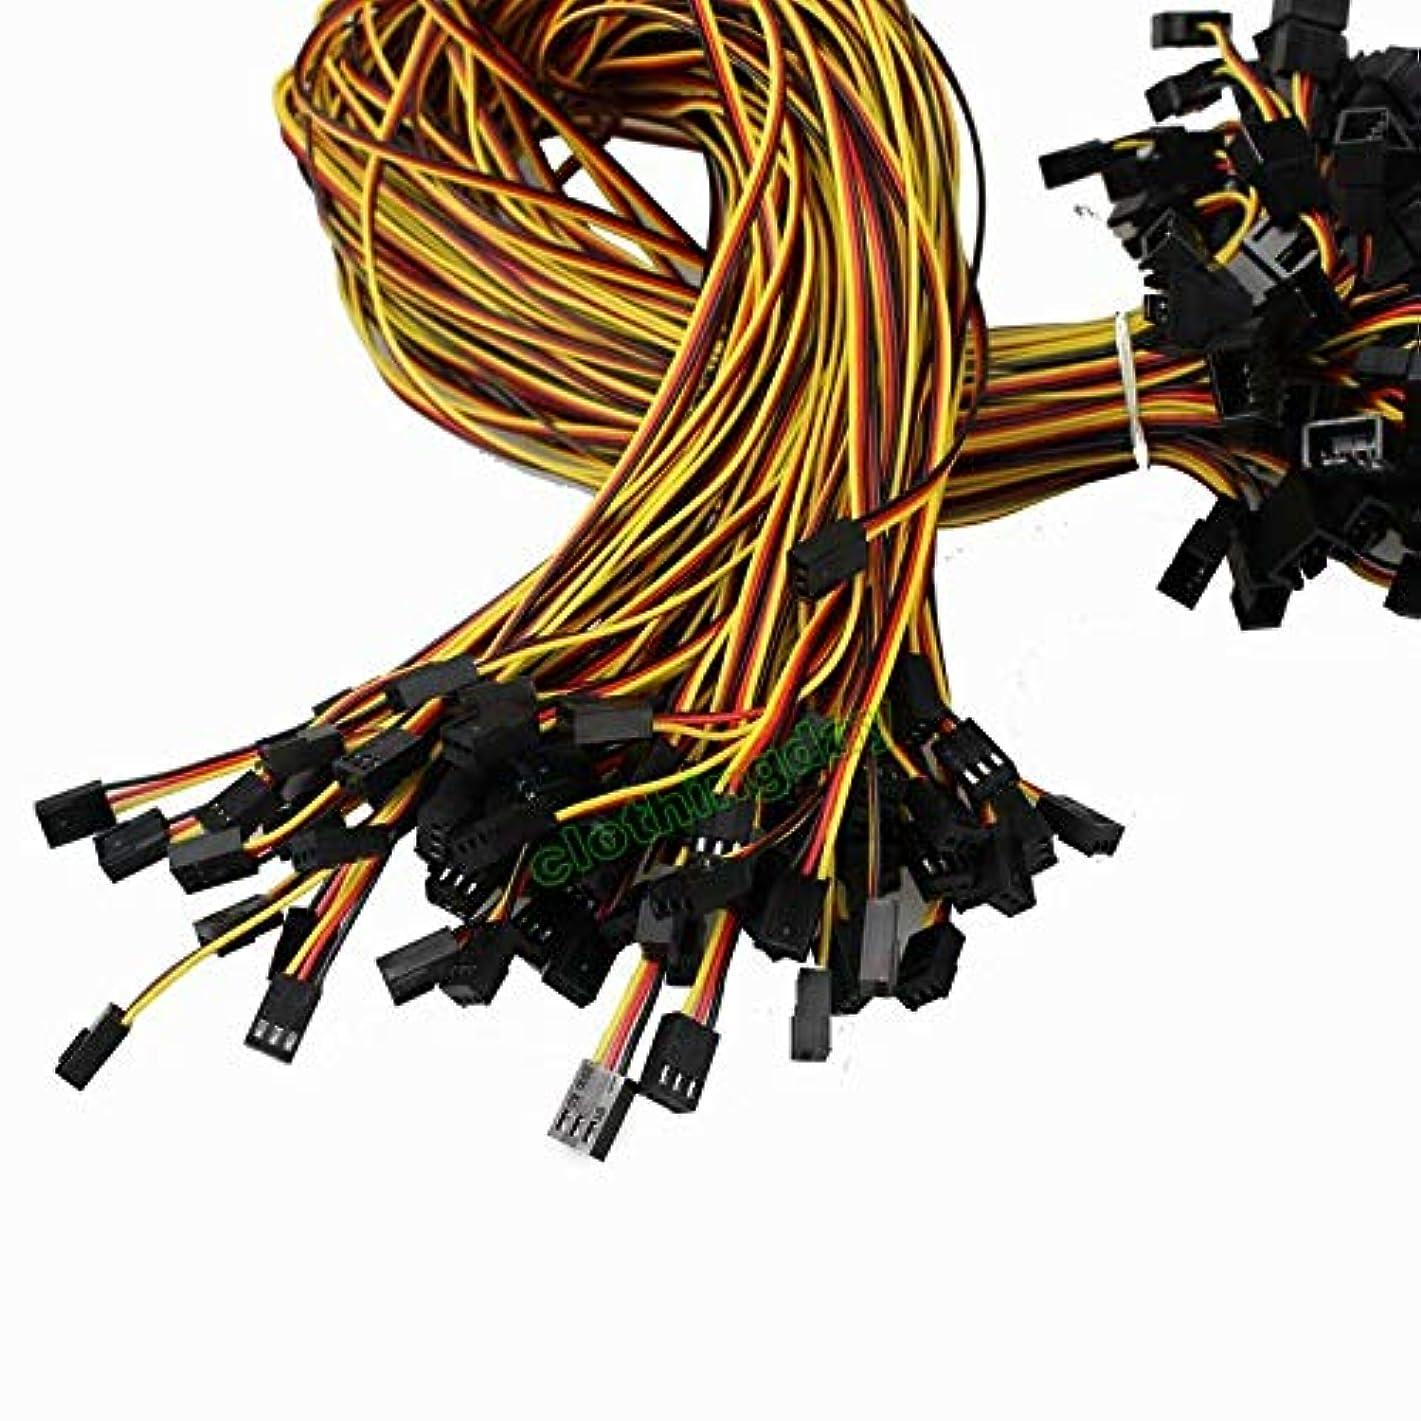 FidgetKute 10pcs Black 60cm 3 Pin Male to Female PC Computer Fan Power Extension Cable New